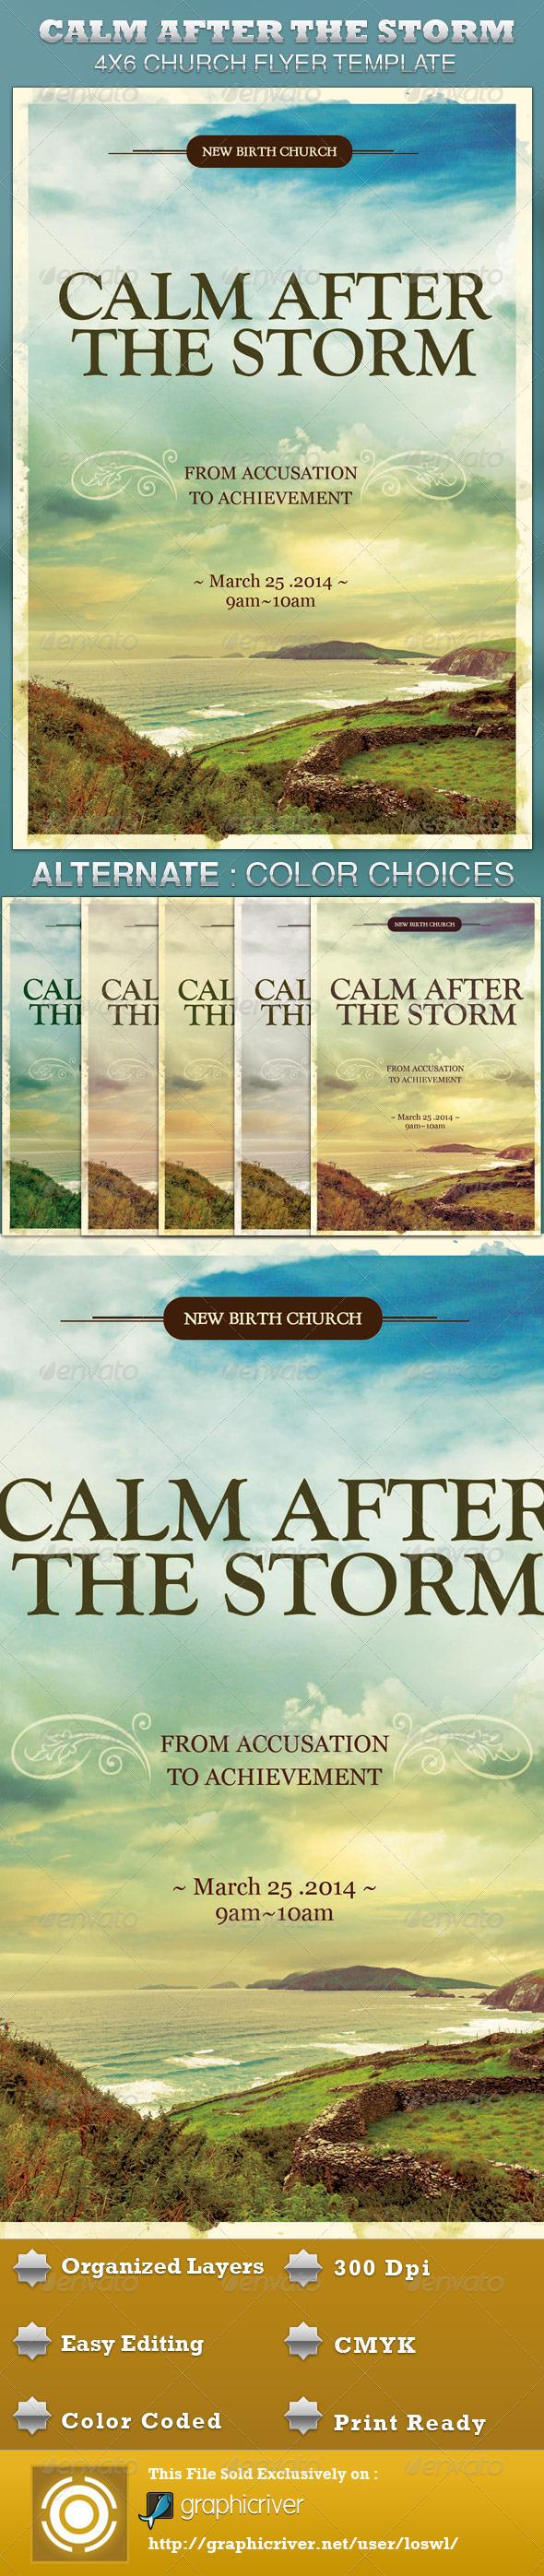 Calm After the Storm Church Flyer Template - Church Flyers